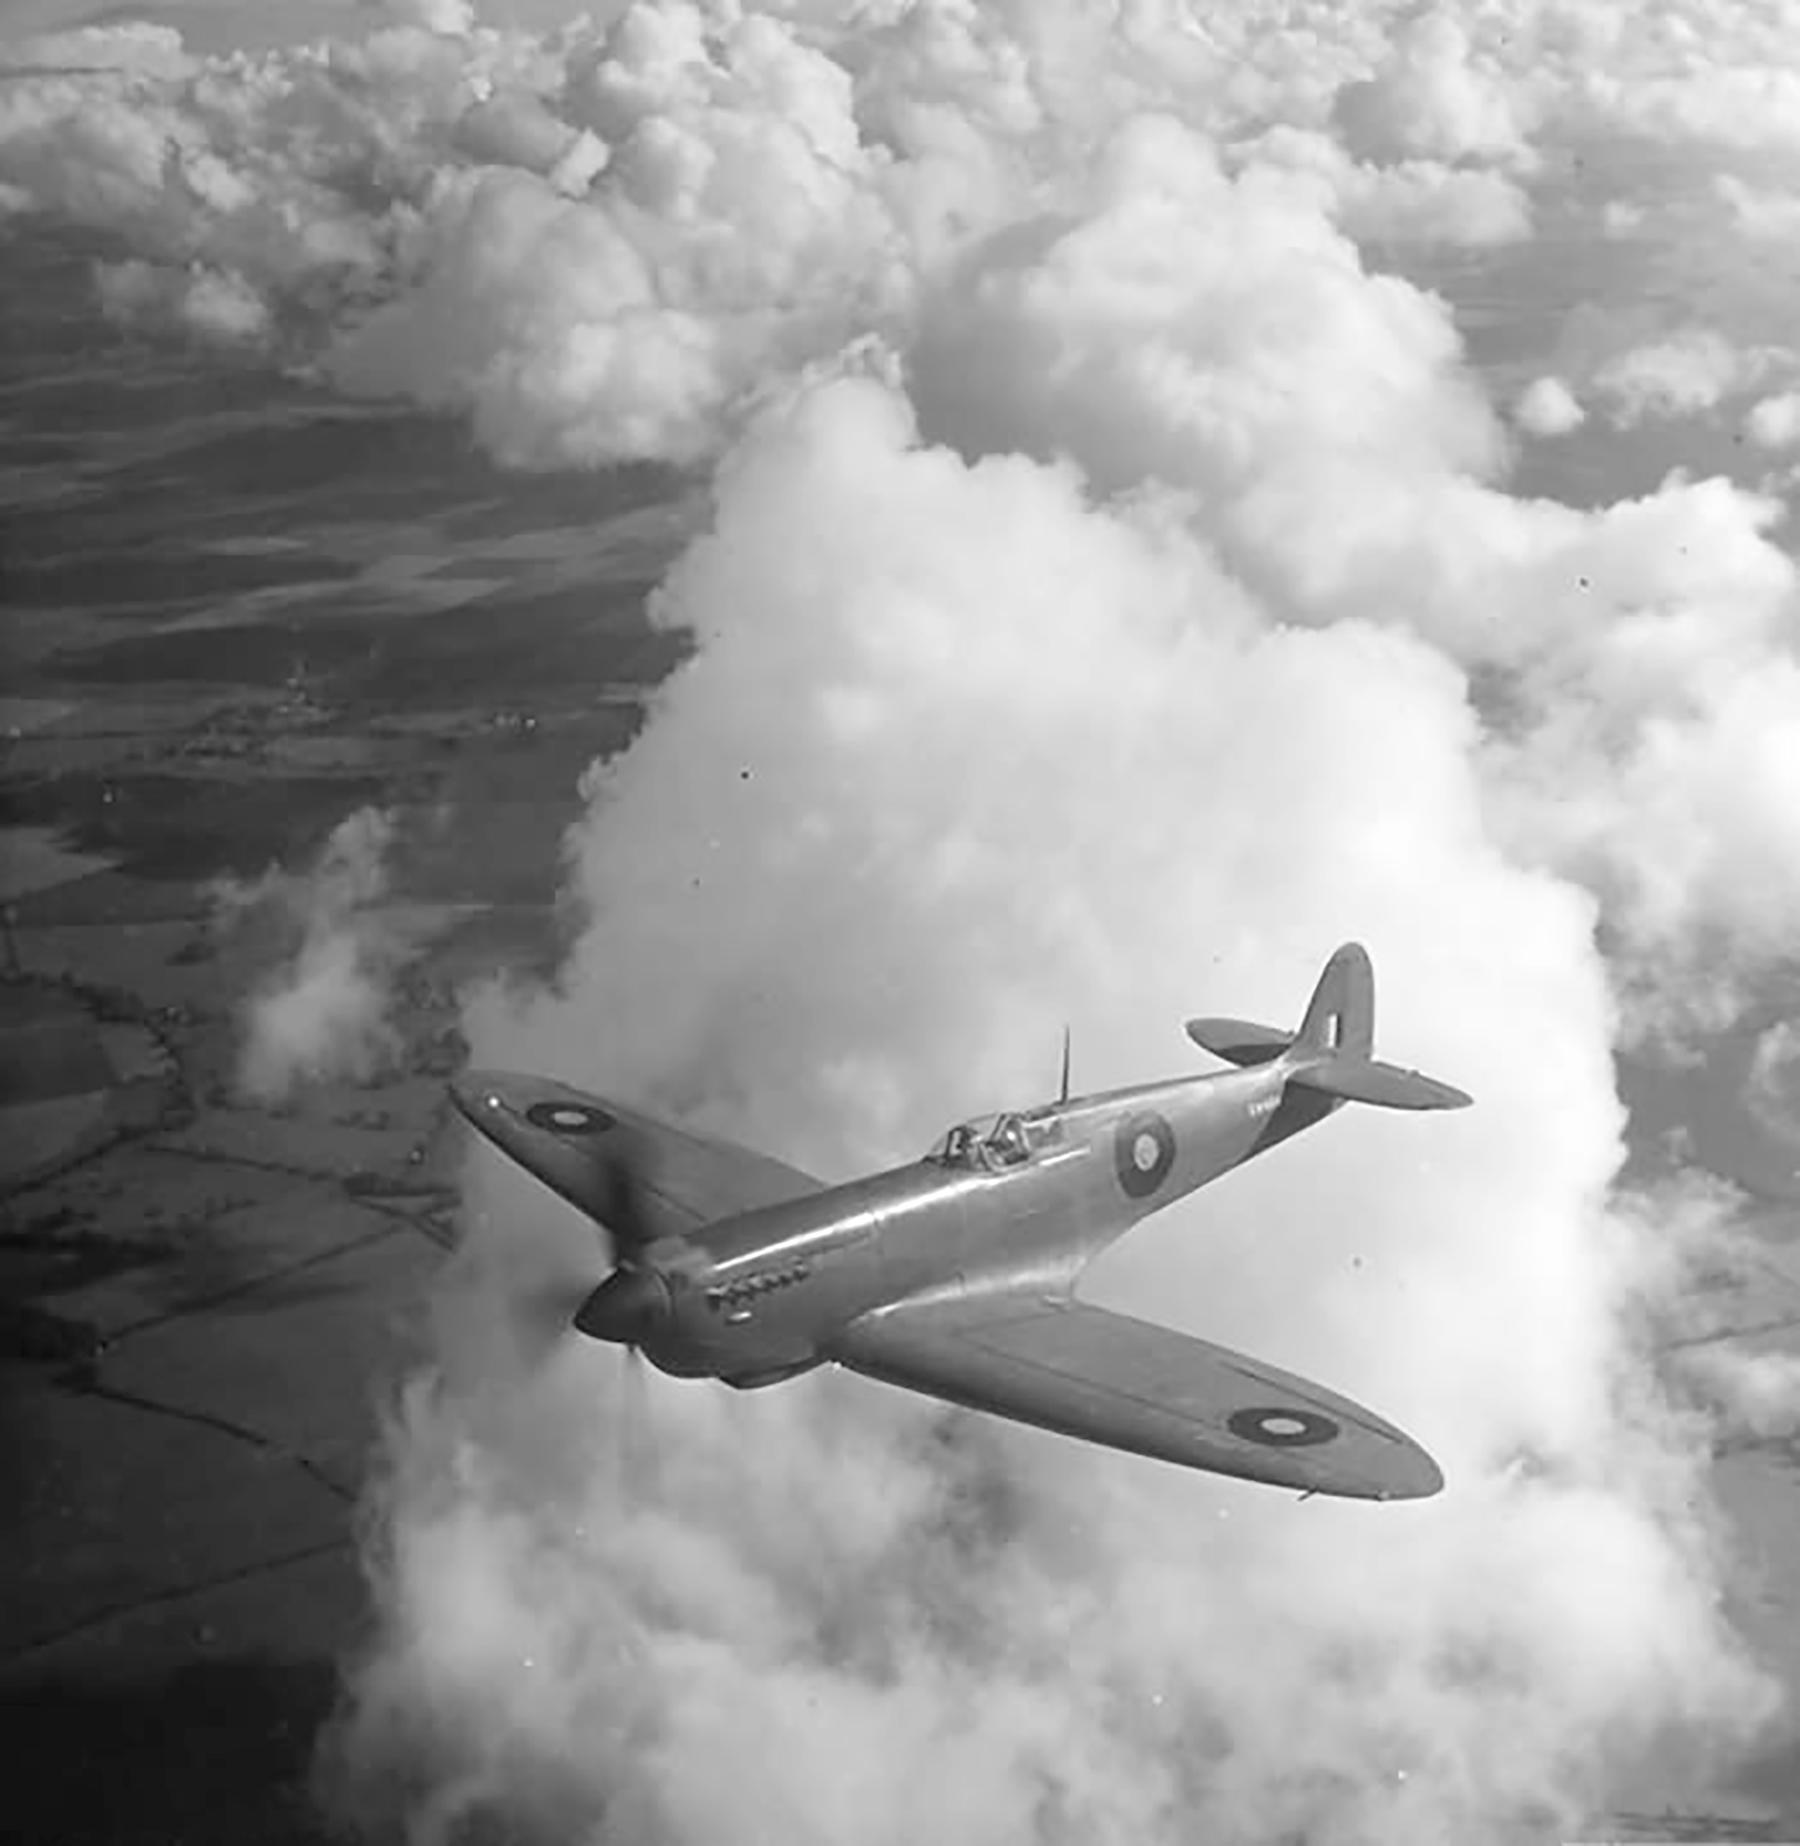 Recon Spitfire PR11 Prototype EN654high speed reconnaissance variant in flight England web 01